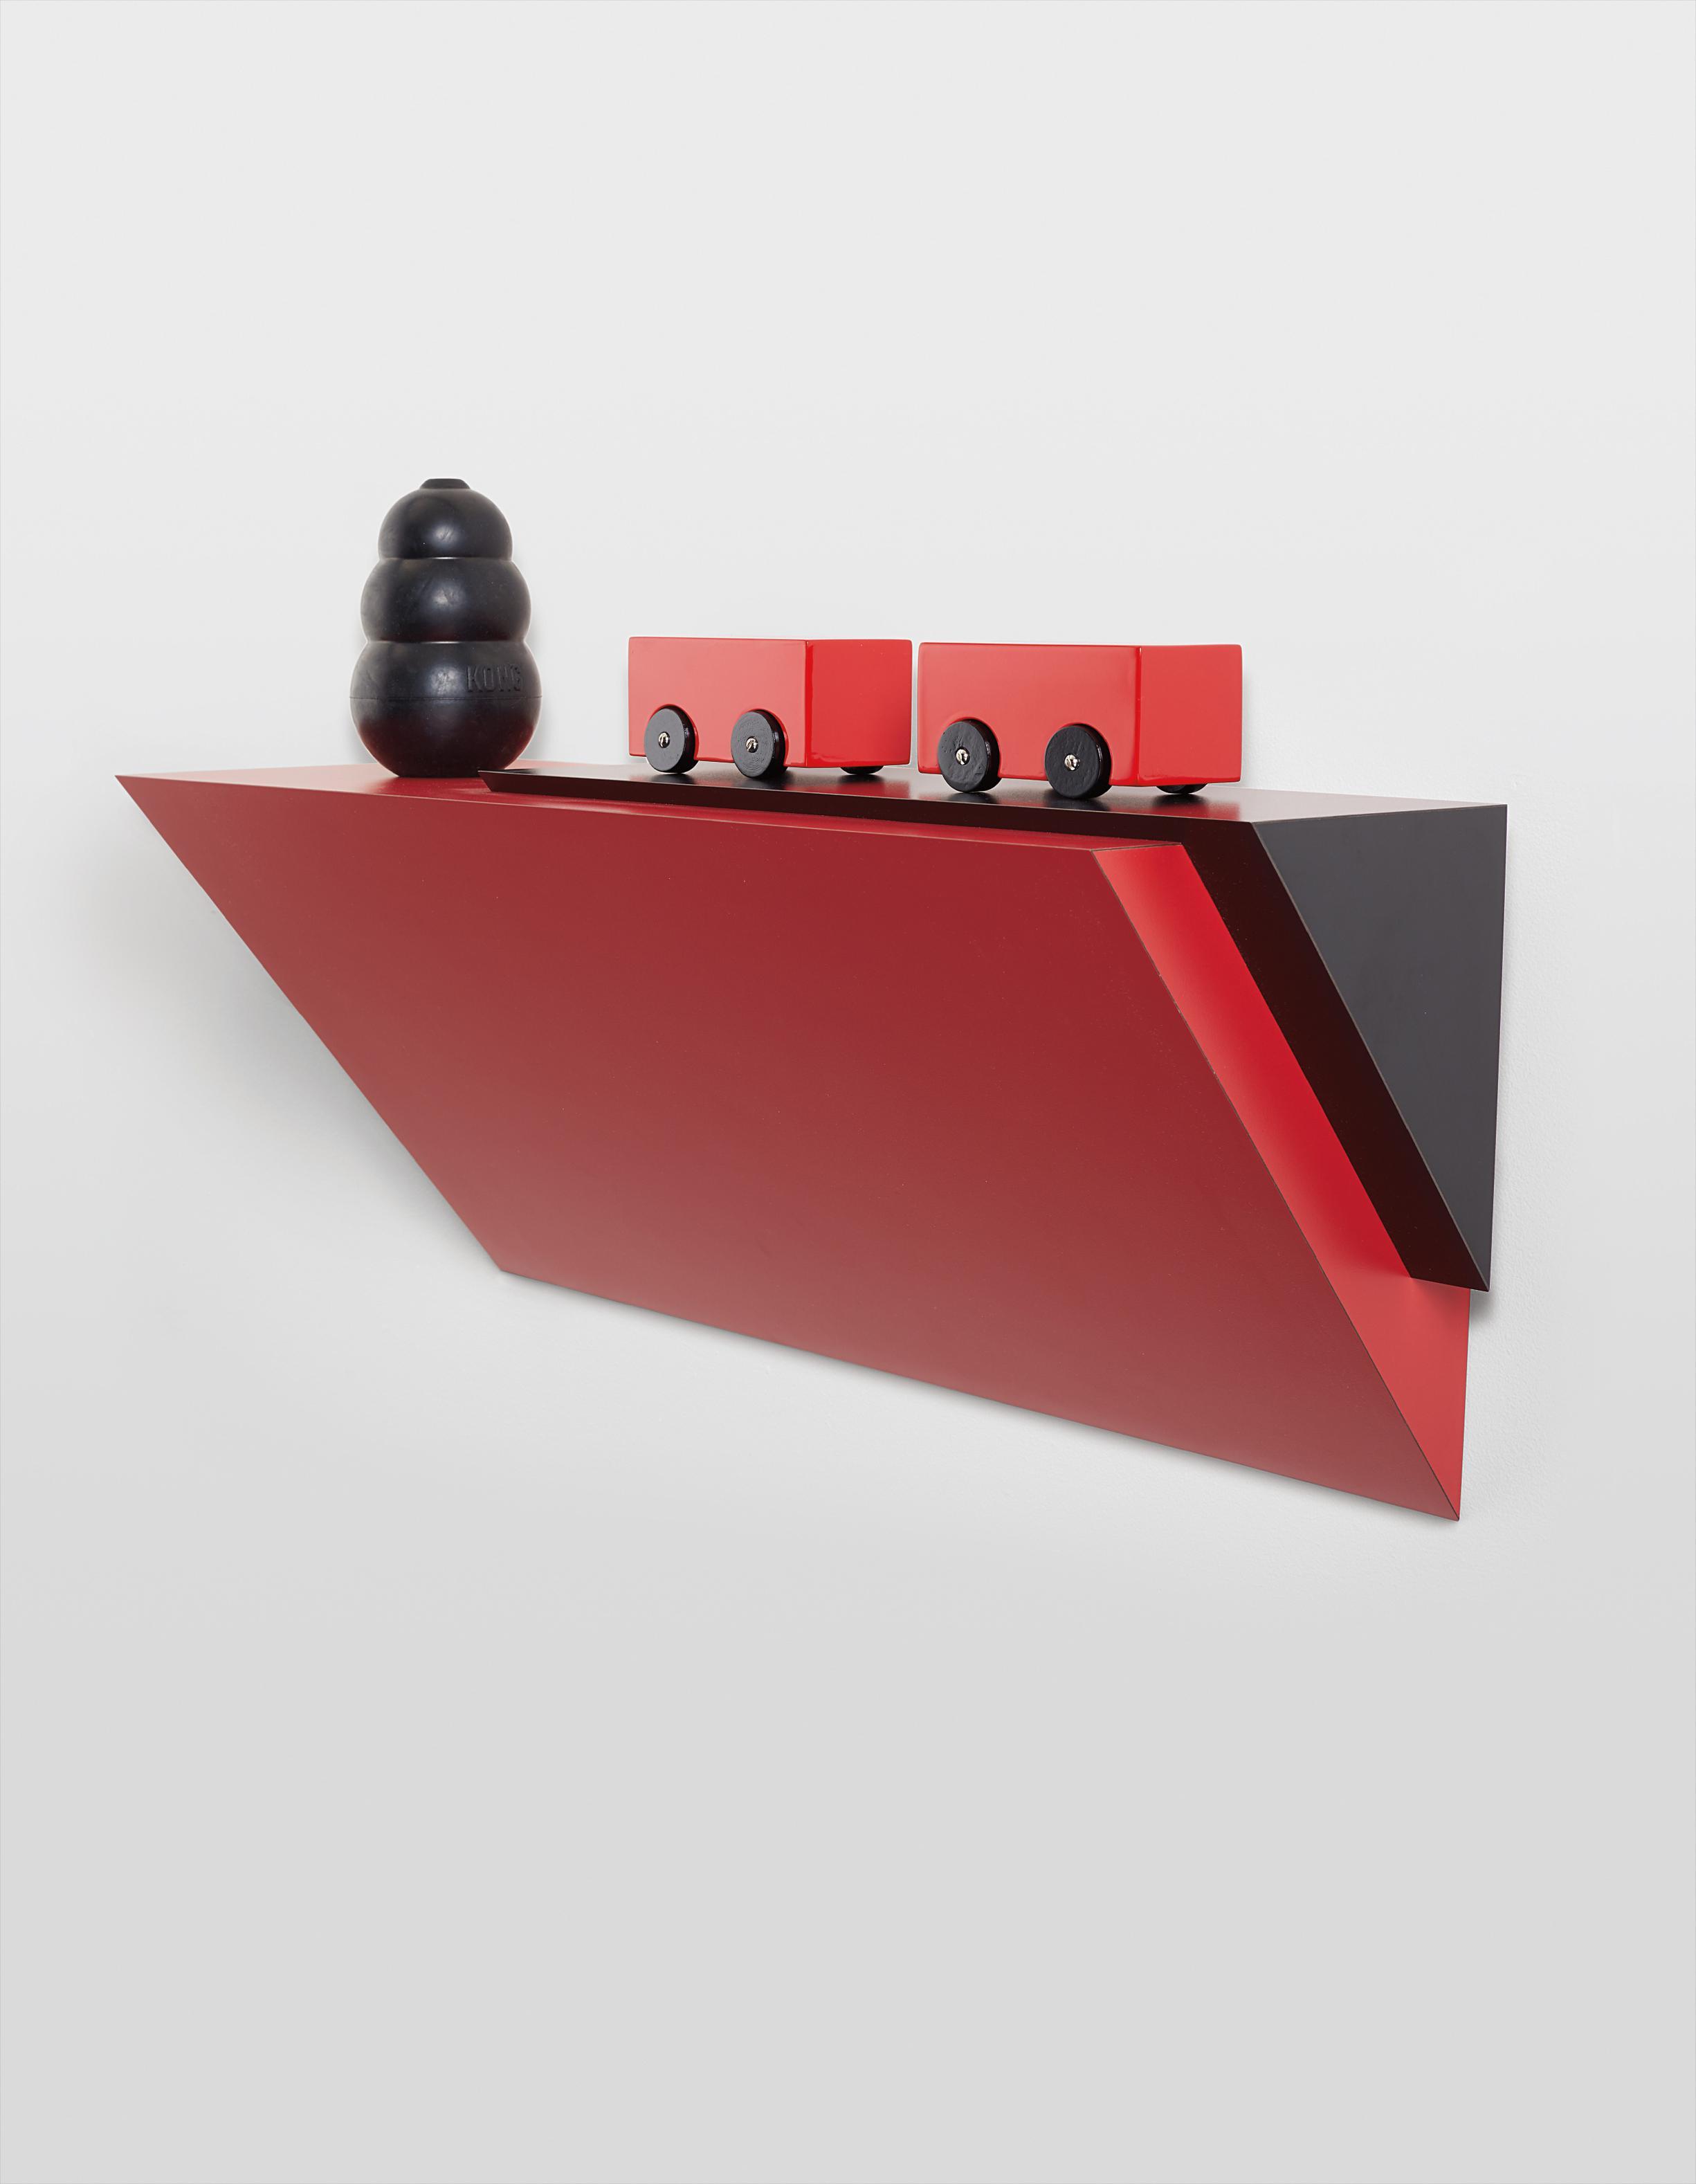 Haim Steinbach-El Lissitzky II-3-2012